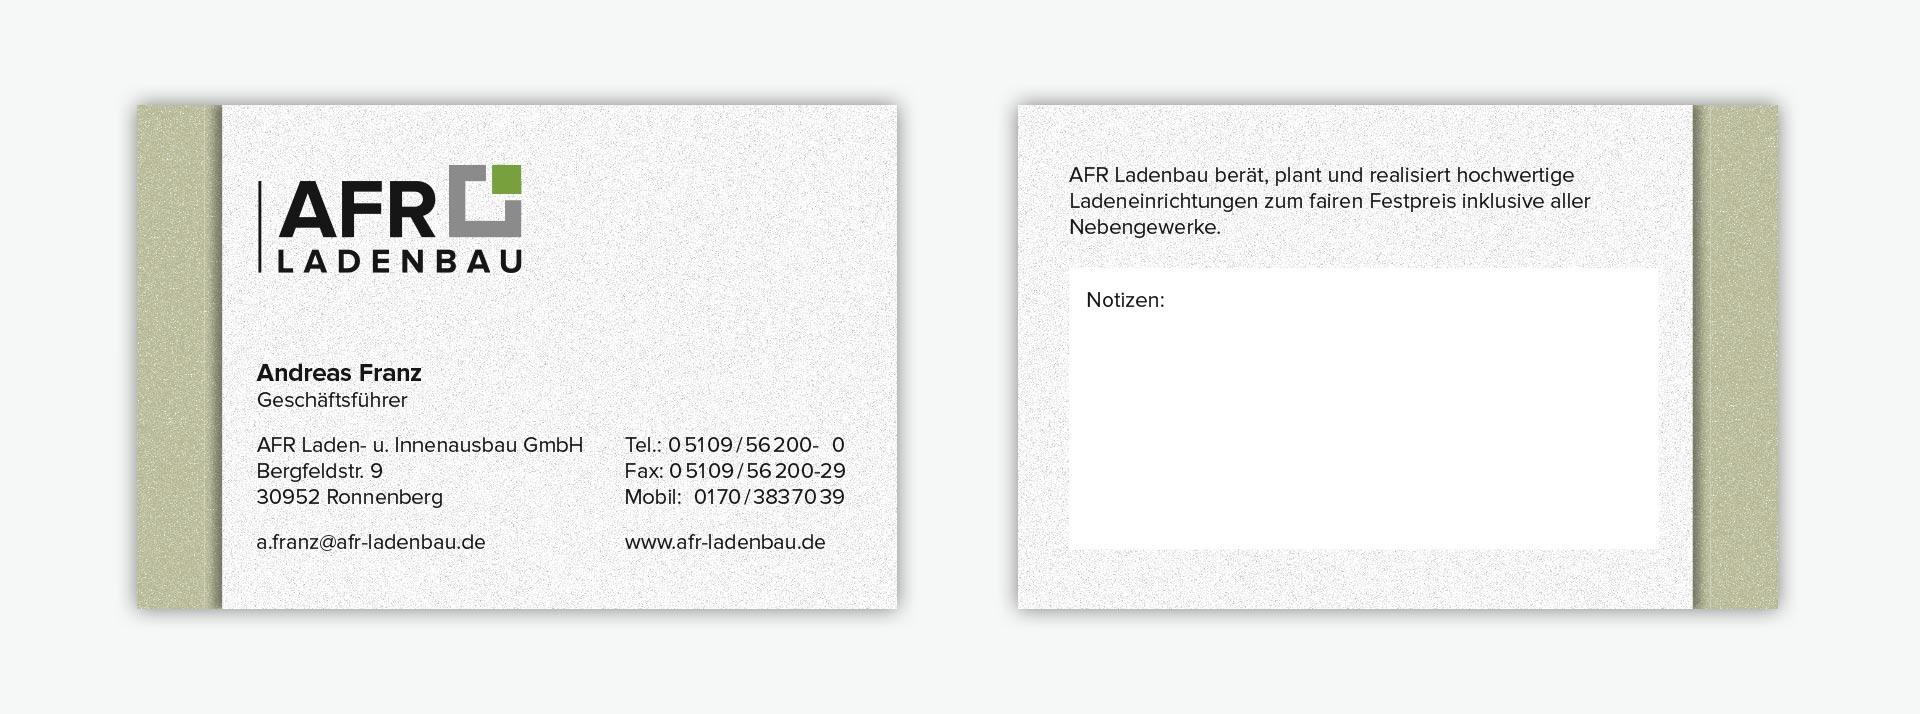 2018 Referenzen Printdesign Visitenkarten Kaffee